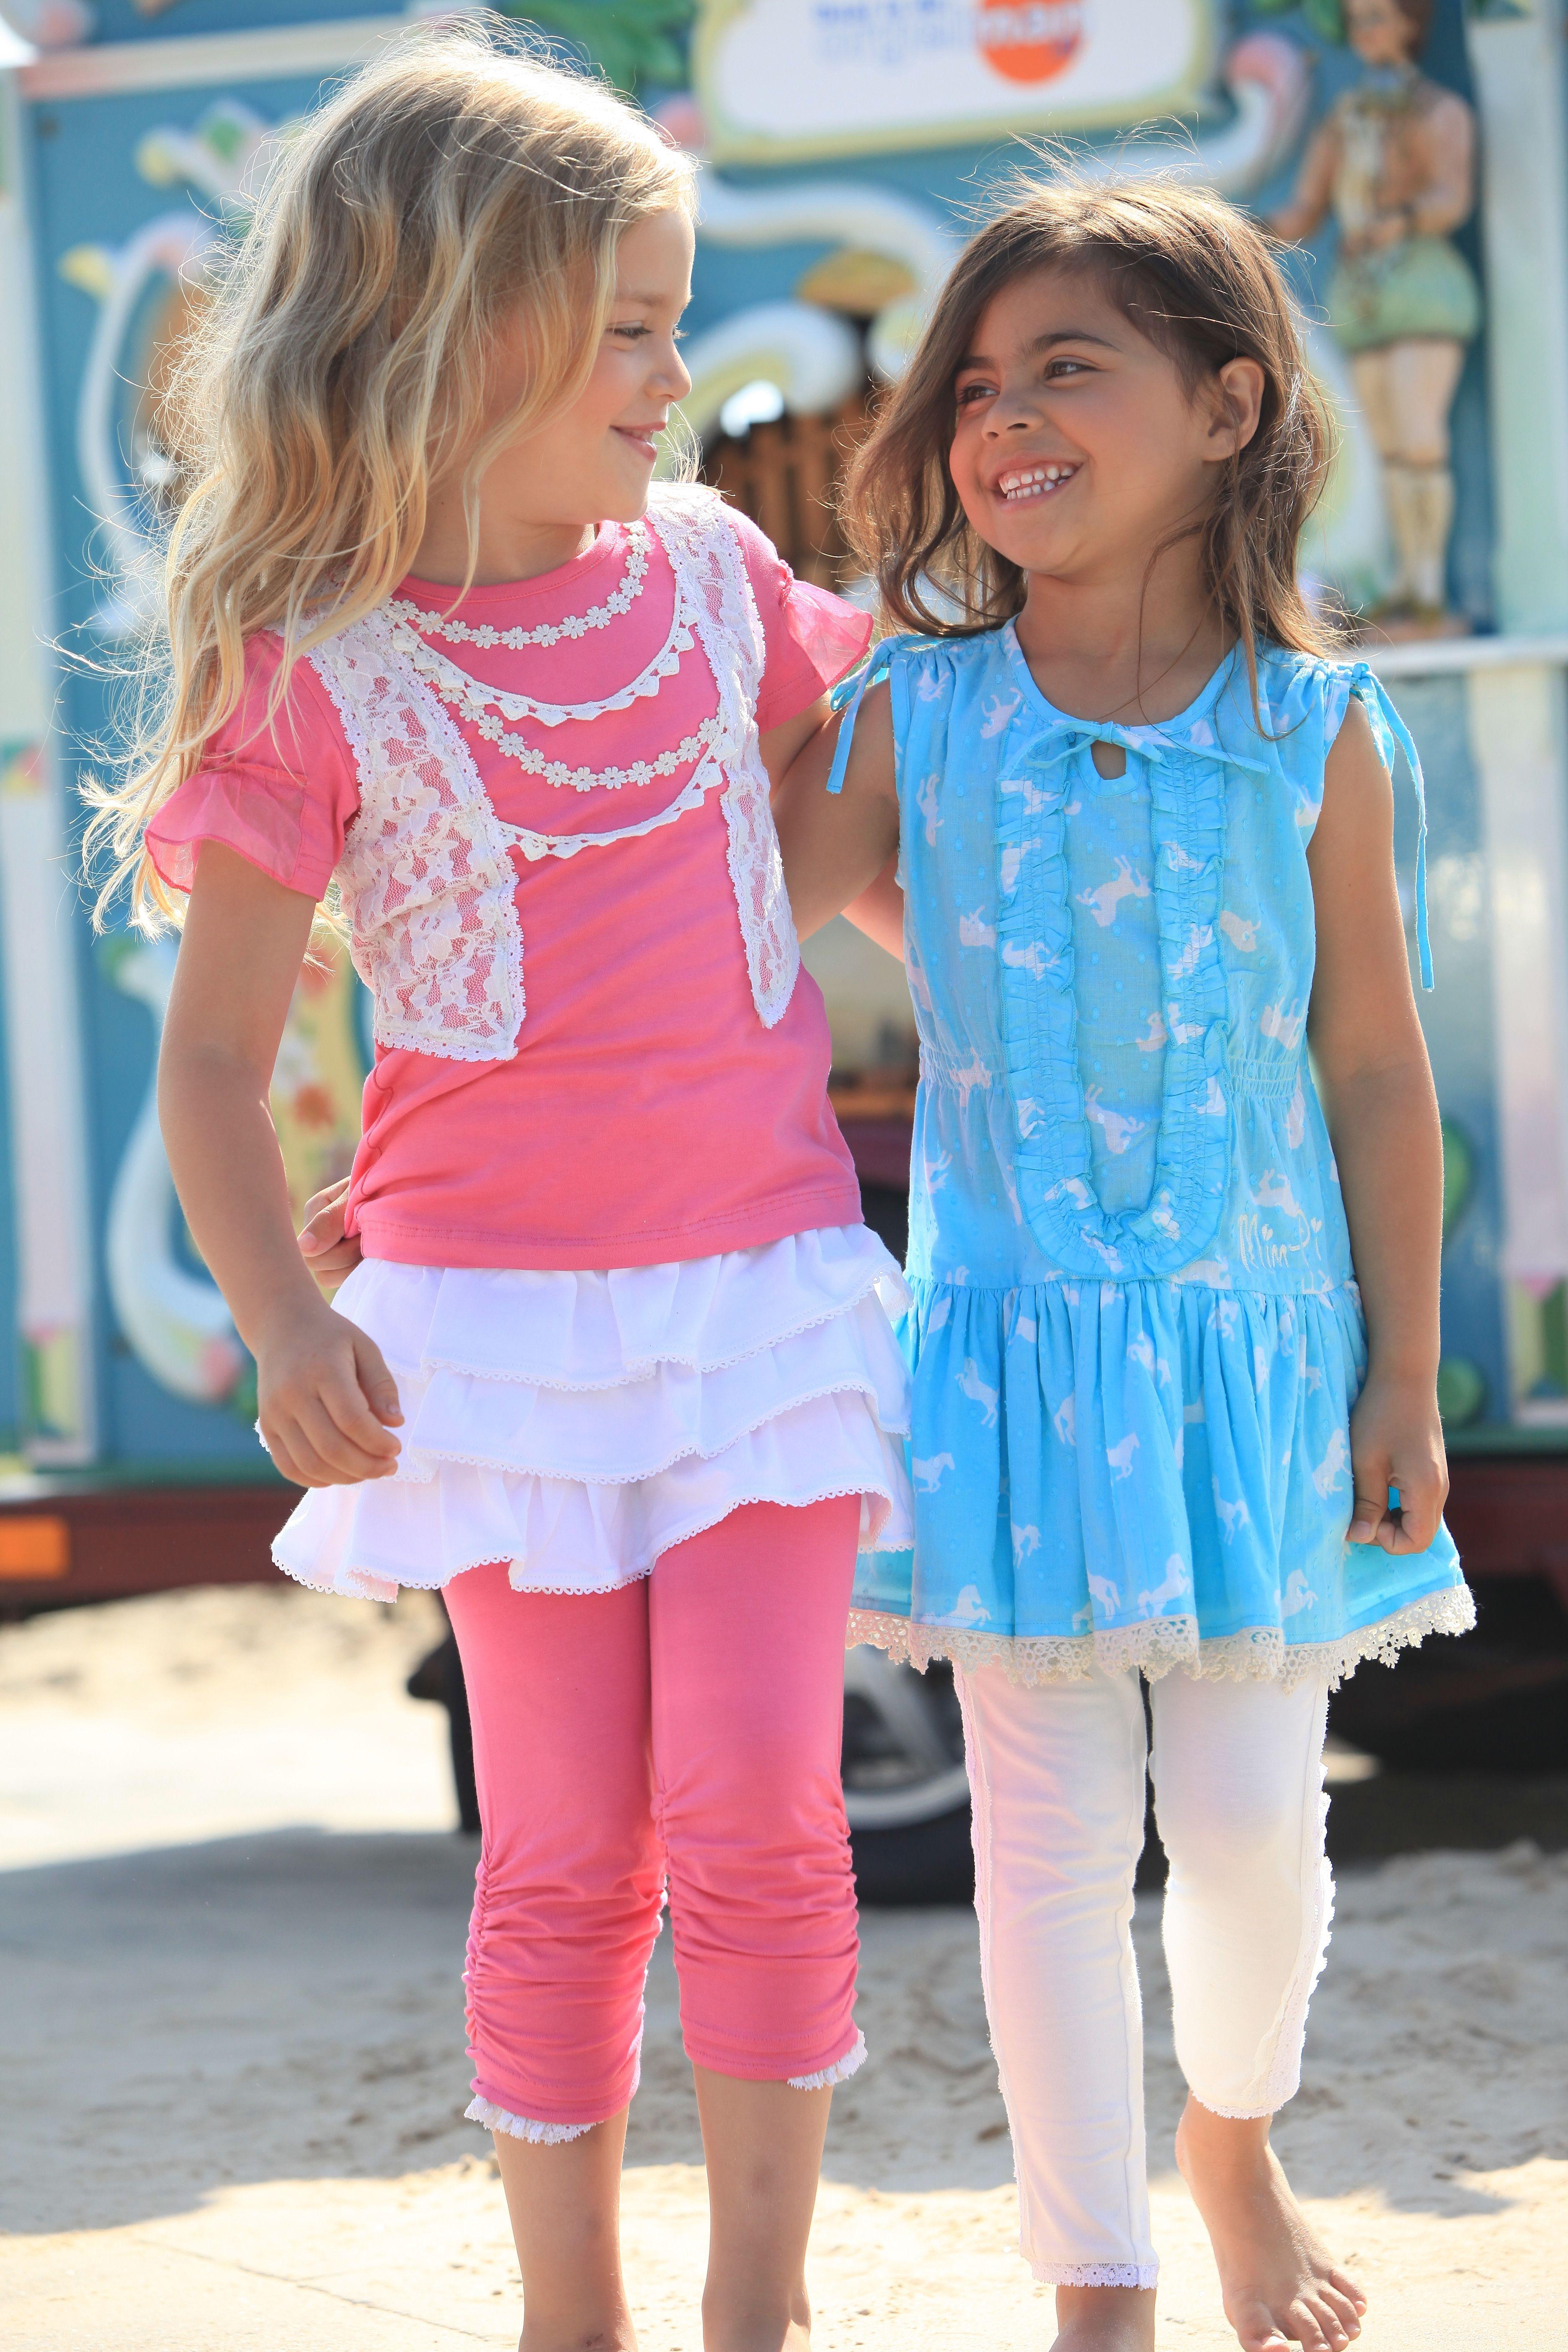 5a3f8e7f4dee Mim-pi girls friends forever #mimpi #cute #girls #kids #clothes #fashion  #pink #blue #aqua